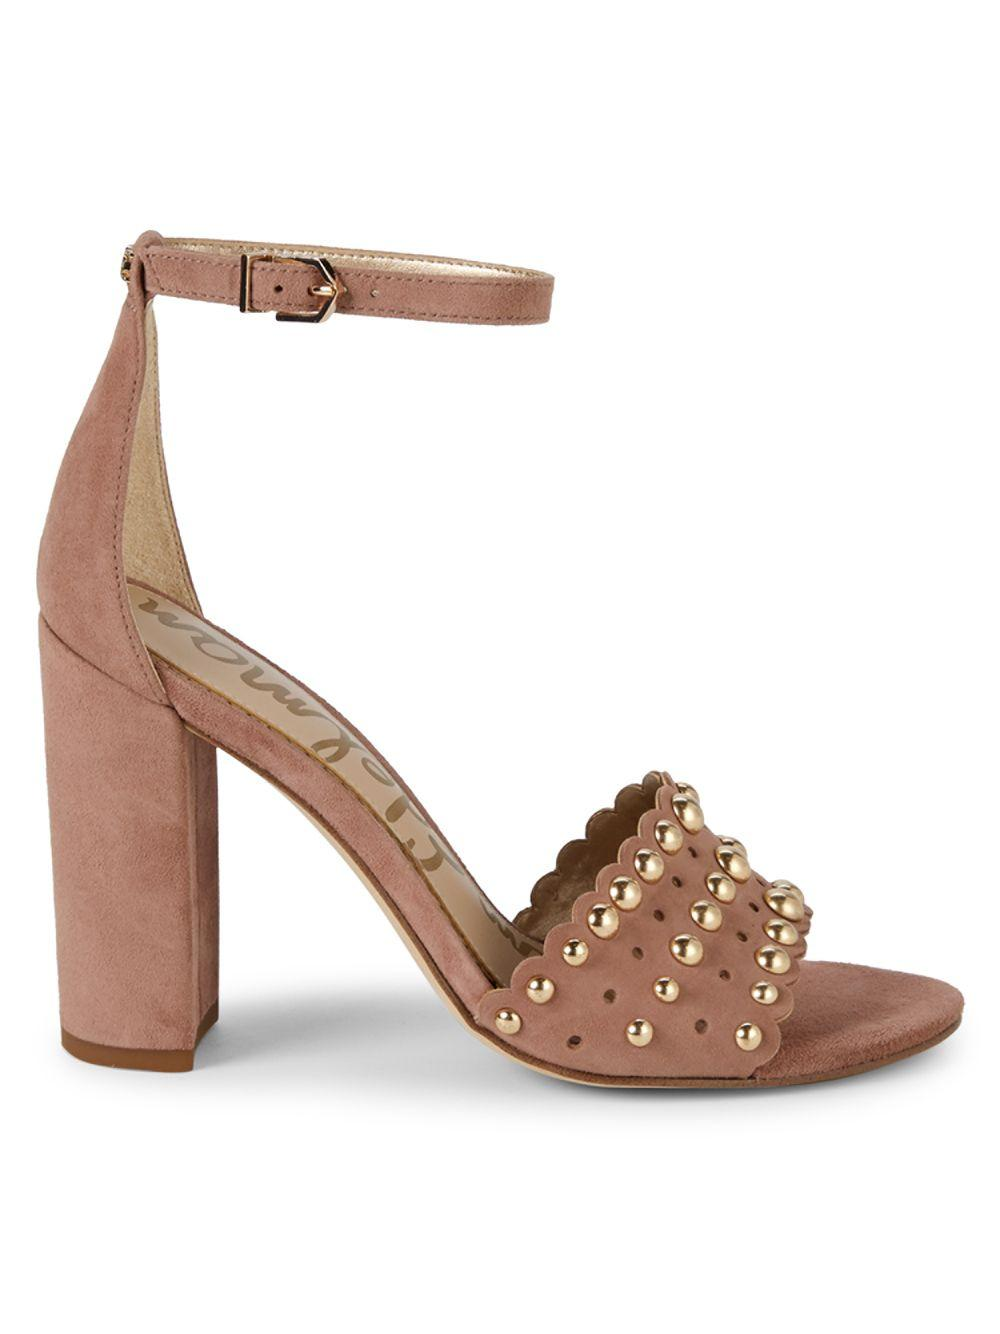 62434fc828dc Lyst - Sam Edelman Yaria Studded Suede Block-heel Sandals in Brown